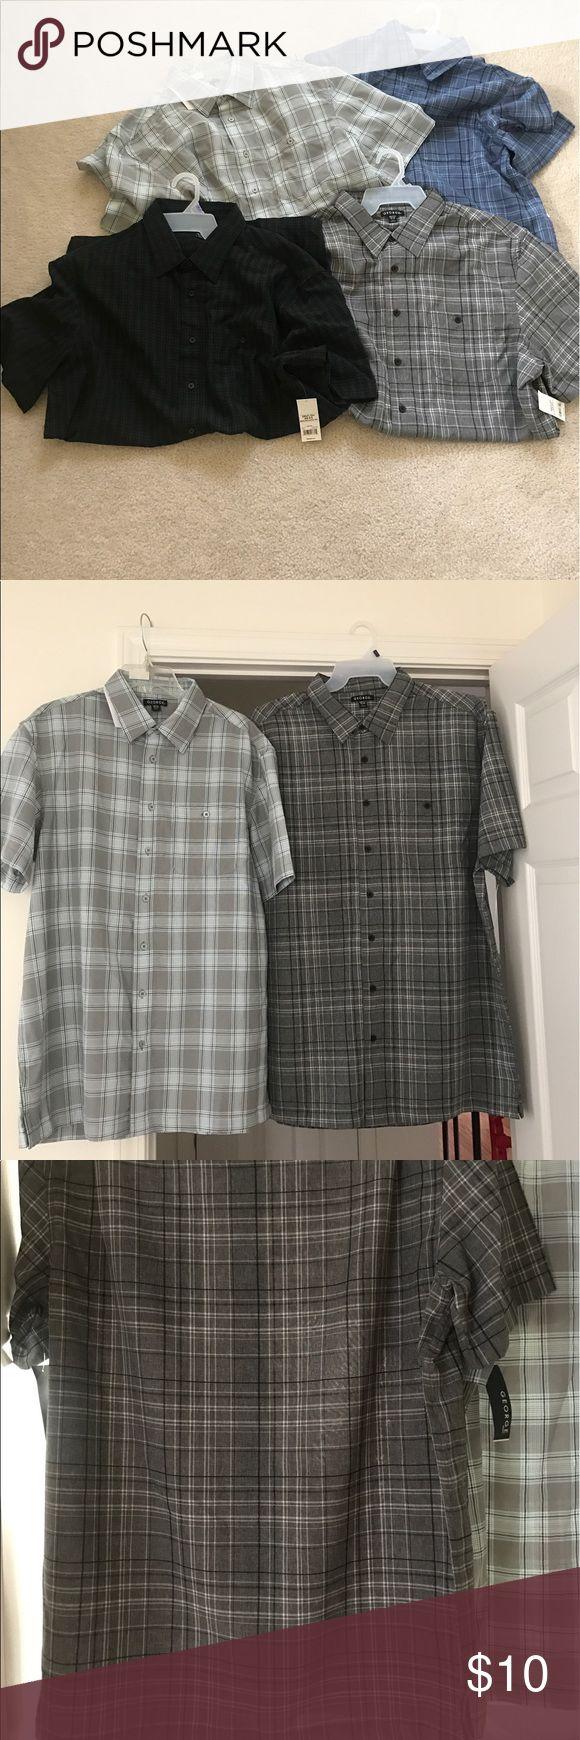 (4) LT Big and tall men short sleeve dress shirts Brand new men's big and tall short sleeve dress shirts, runs a little small.(1) blue and black,(1) gray, black and teal (1) charcoal (1)black and gray. George Shirts Casual Button Down Shirts